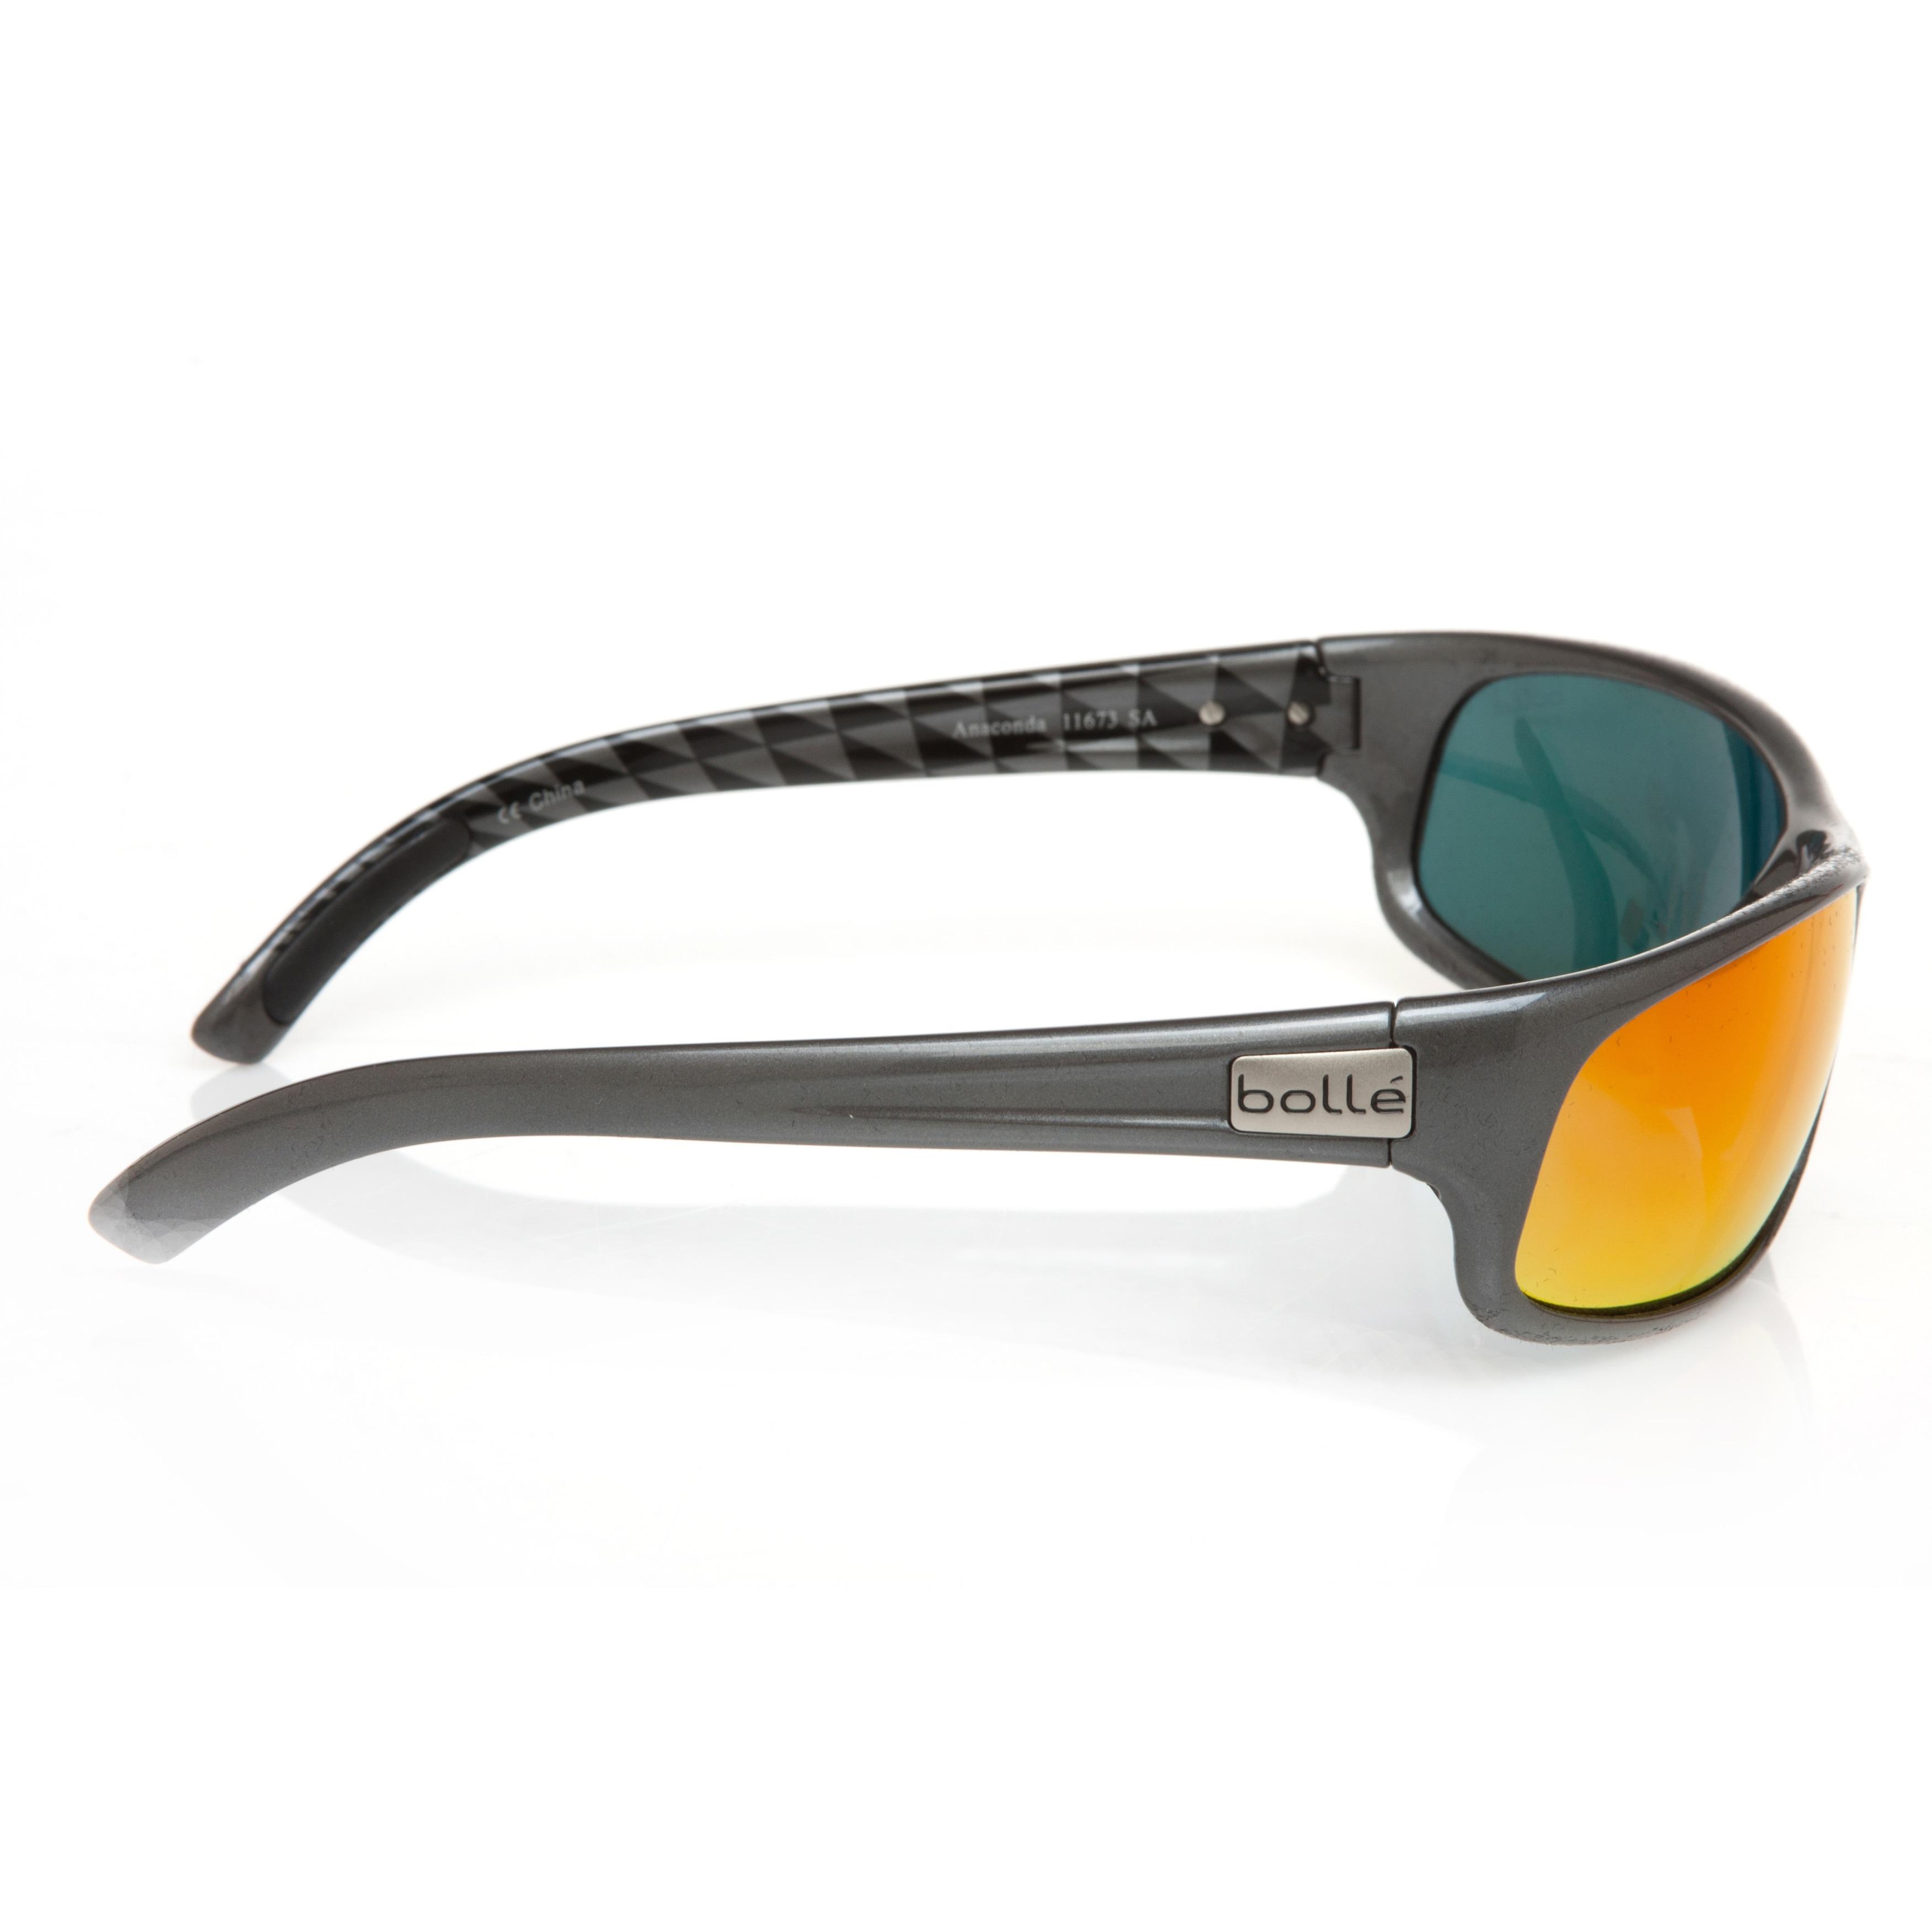 2de24623b61ce Bolle Sport Anaconda Men's Polarized Sunglasses « Heritage Malta